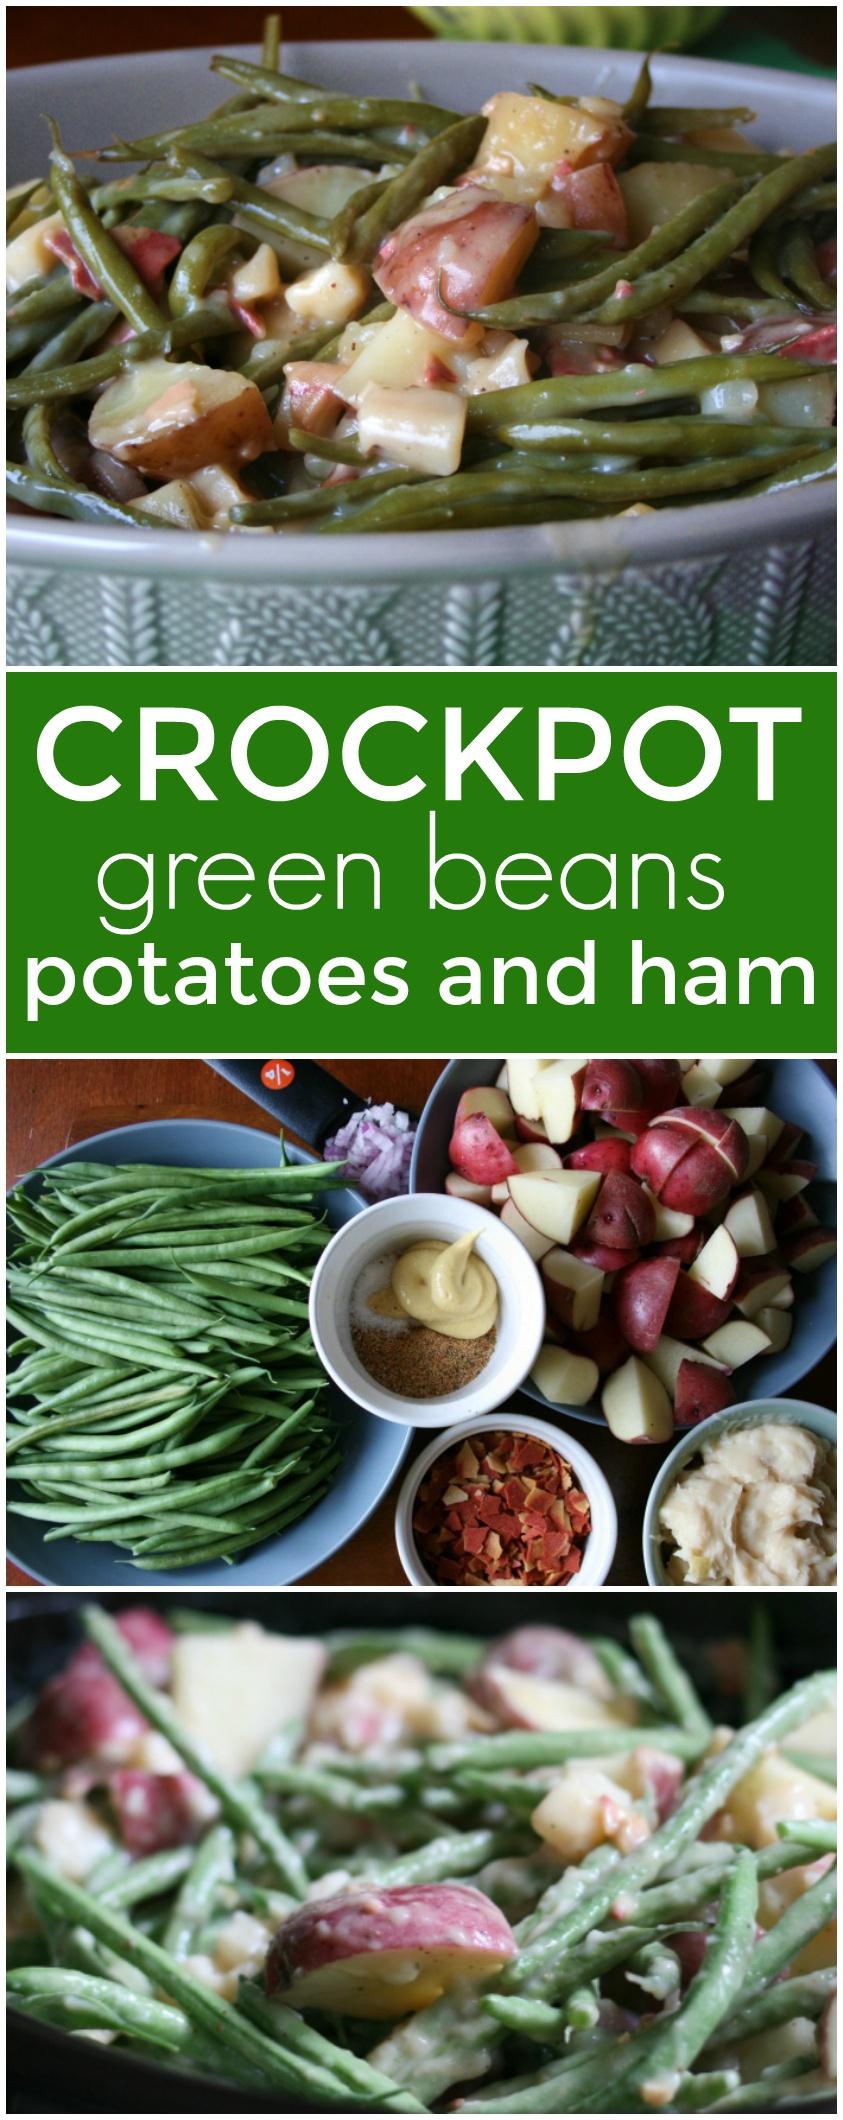 Crockpot Green Beans Potatoes and Ham via @familyfresh